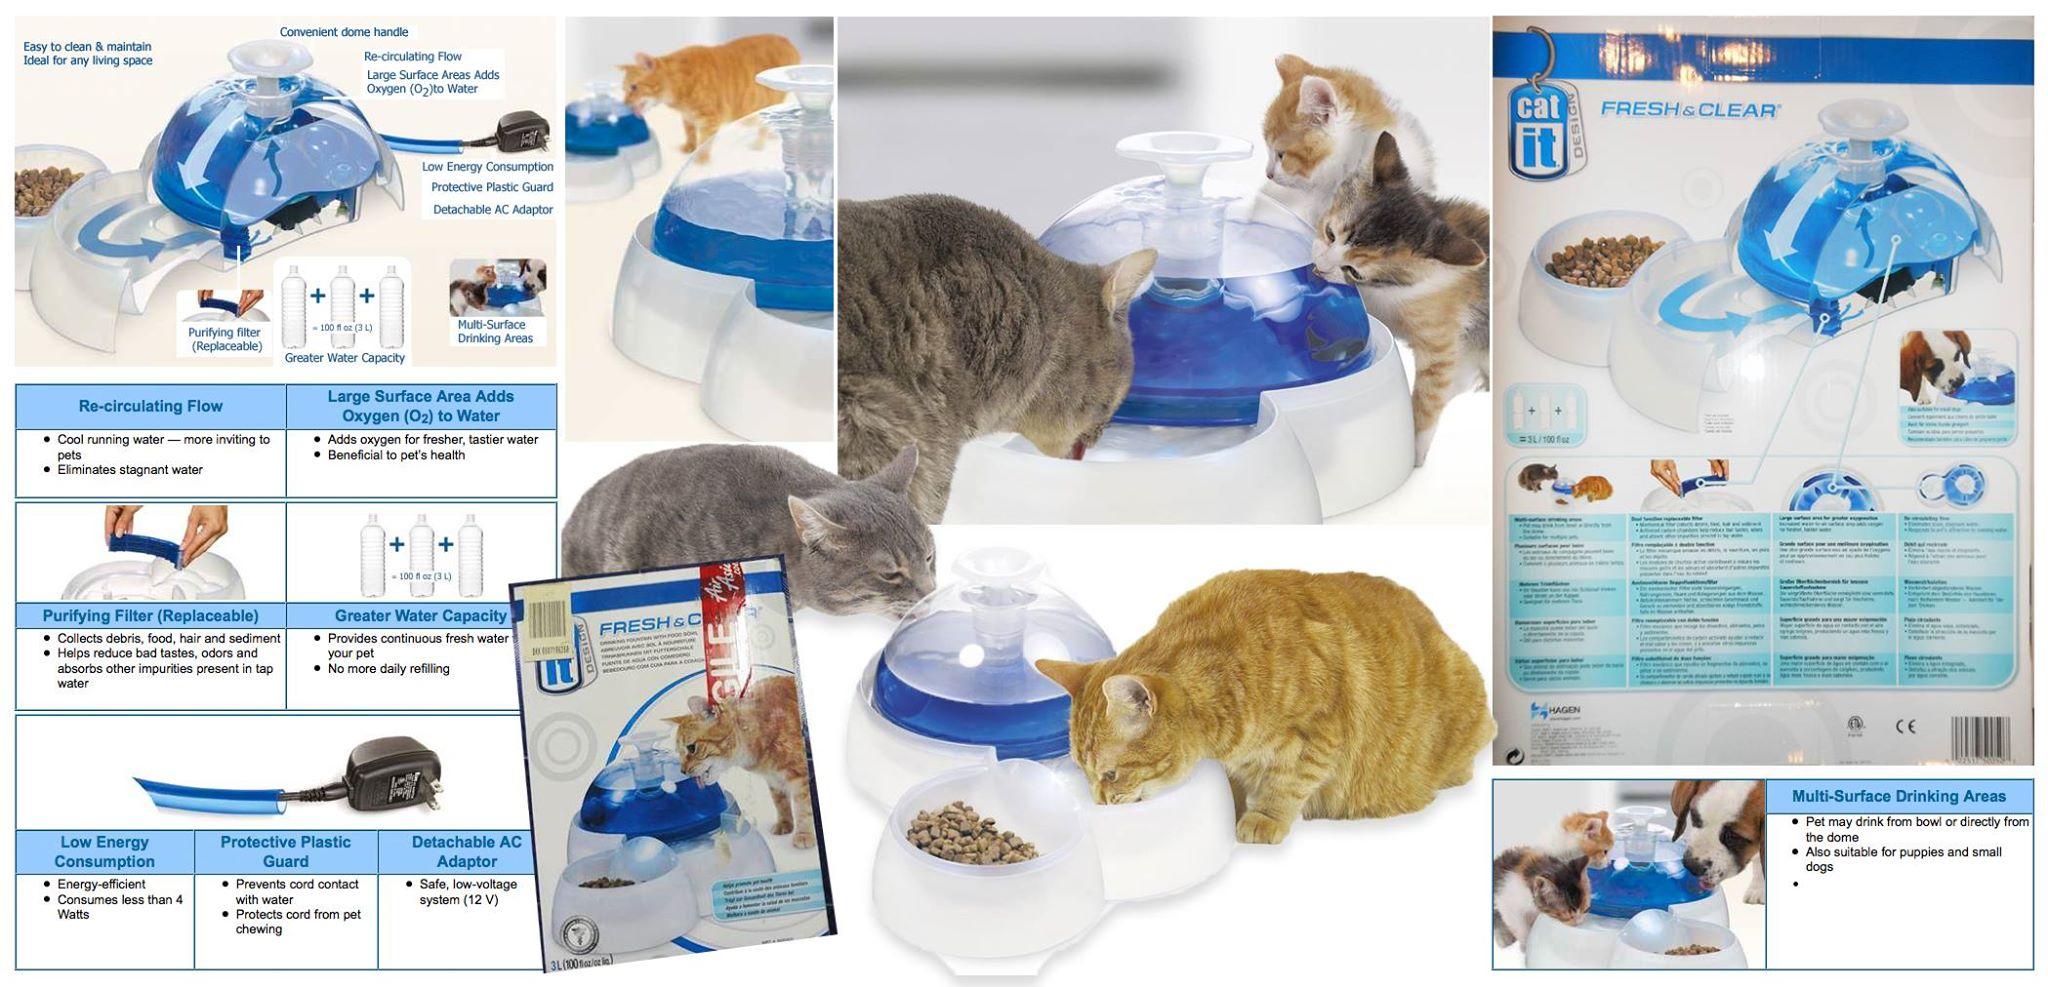 cat it - Fresh & Clear น้ำพุและชามอาหารในหนึ่งเดียว